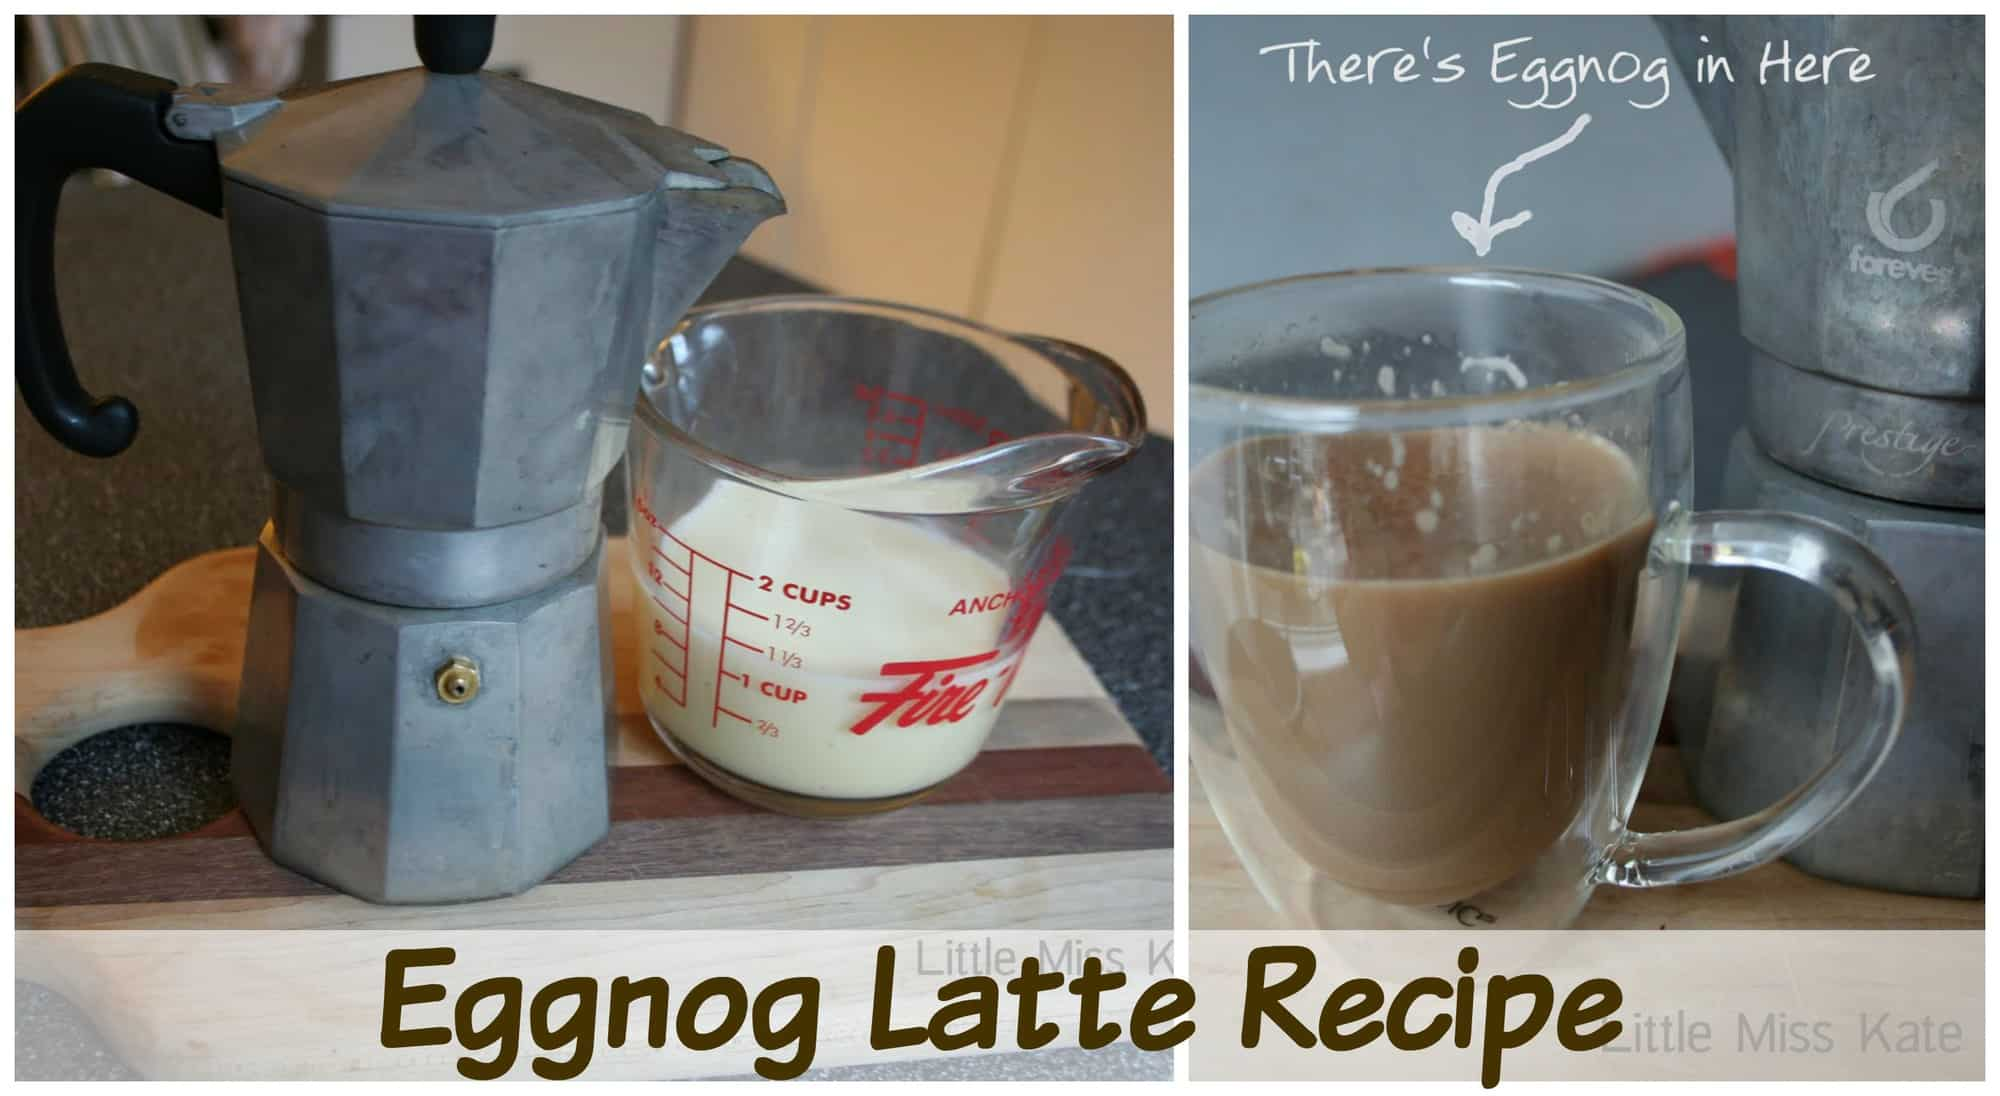 Eggnog Latte Recipe – Christmas Beverage Idea